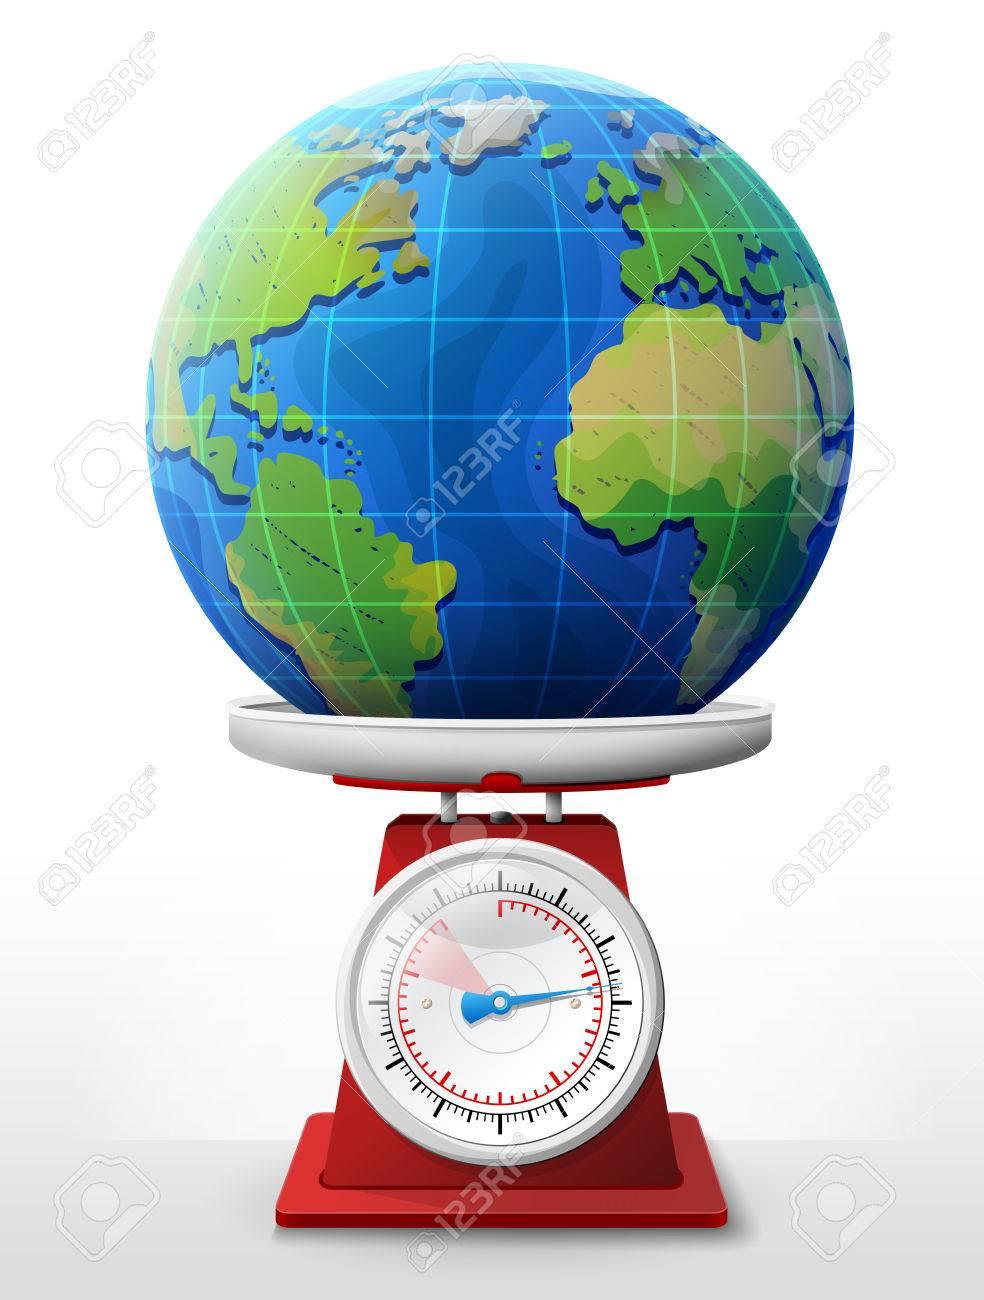 https://www.exploratorium.edu/ronh/weight/index.html